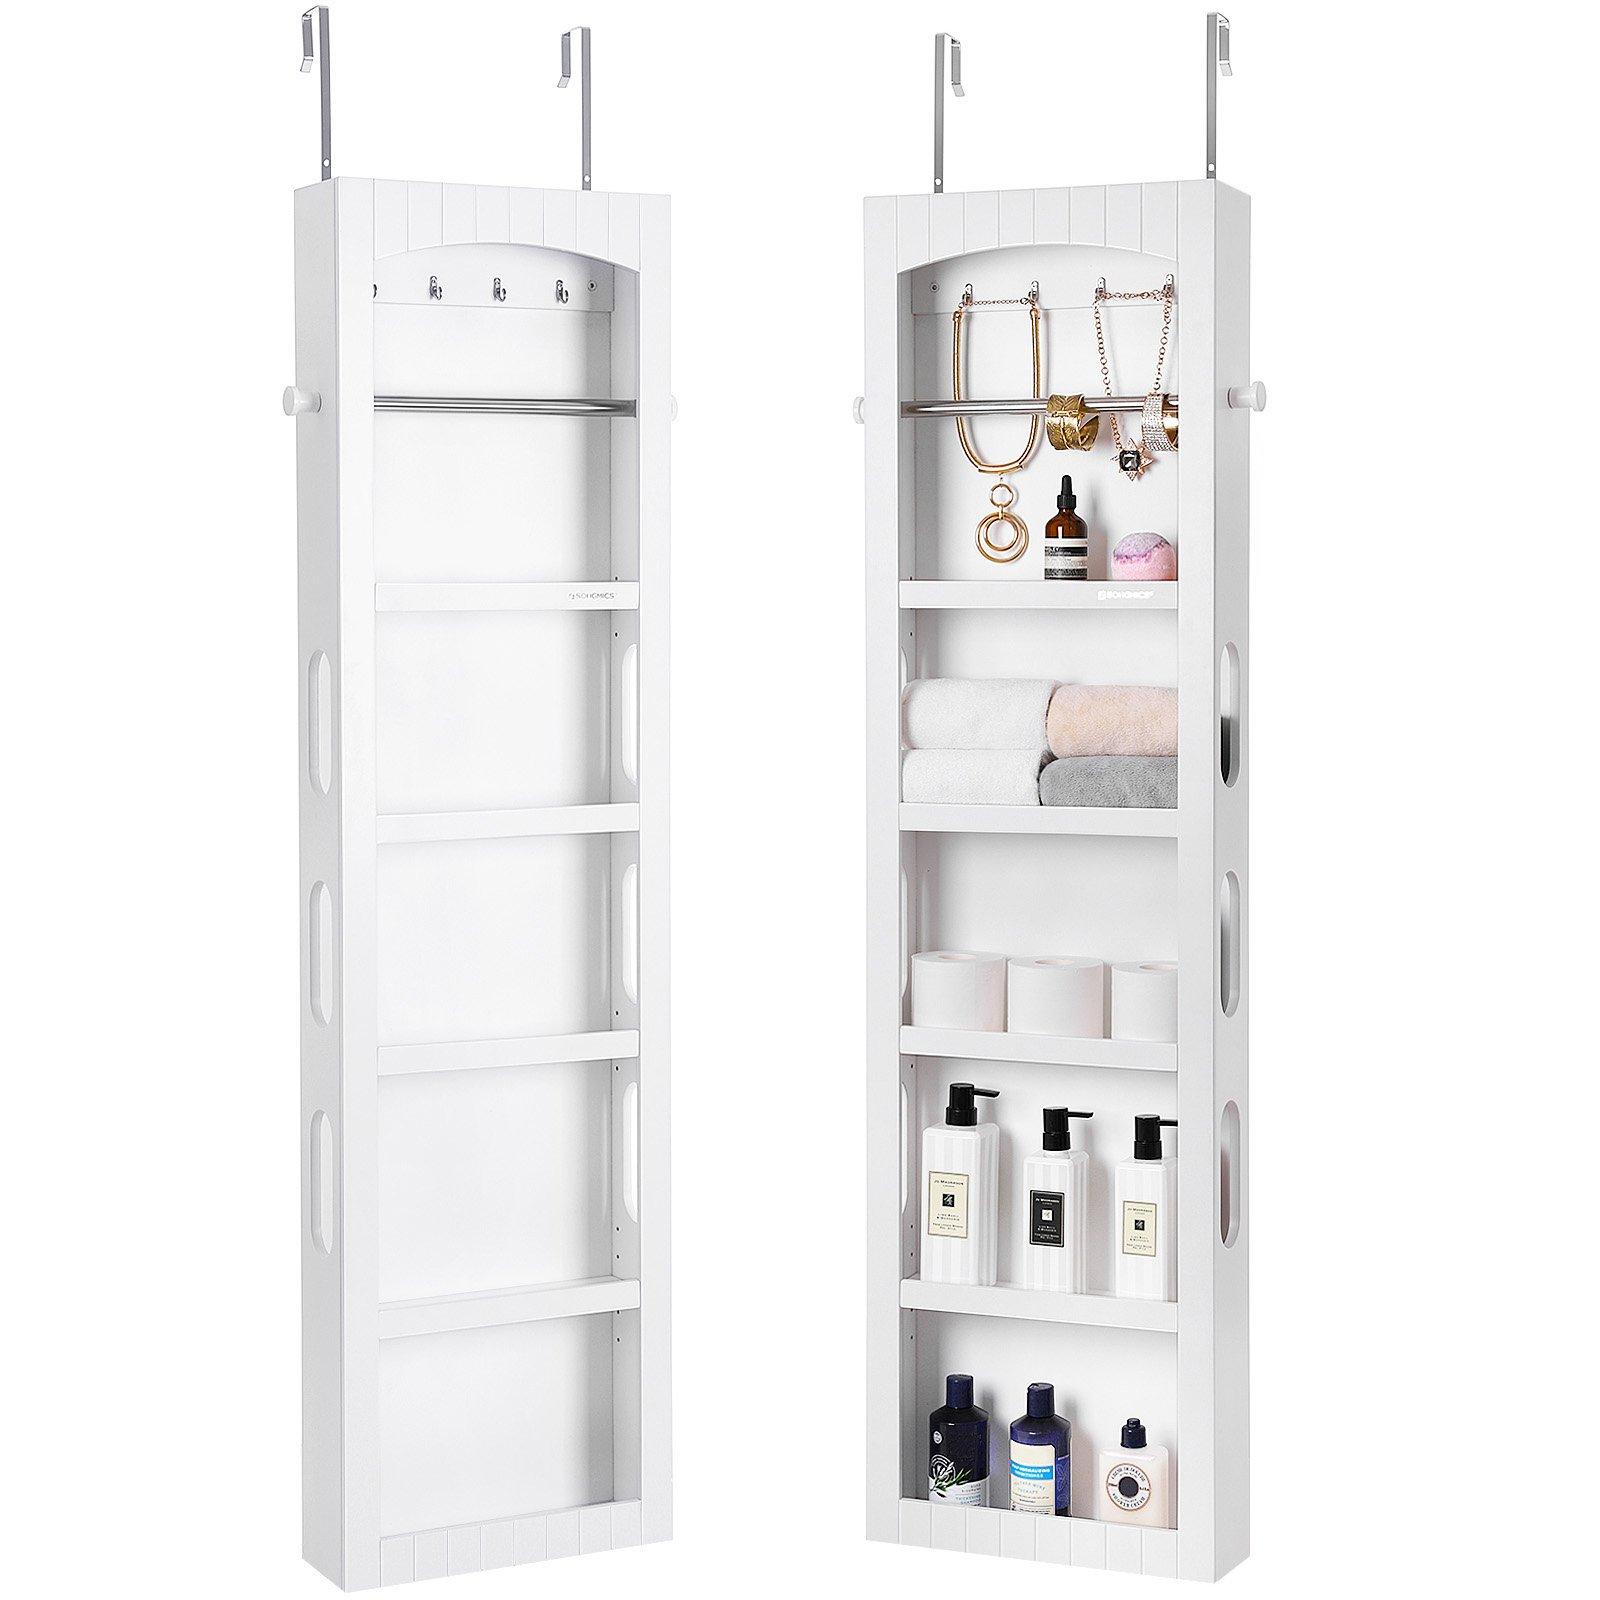 SONGMICS Bathroom Storage Cabinet, Door/Wall Mounted Save Floor Space, Adjustable Shelves White UBBC74WT